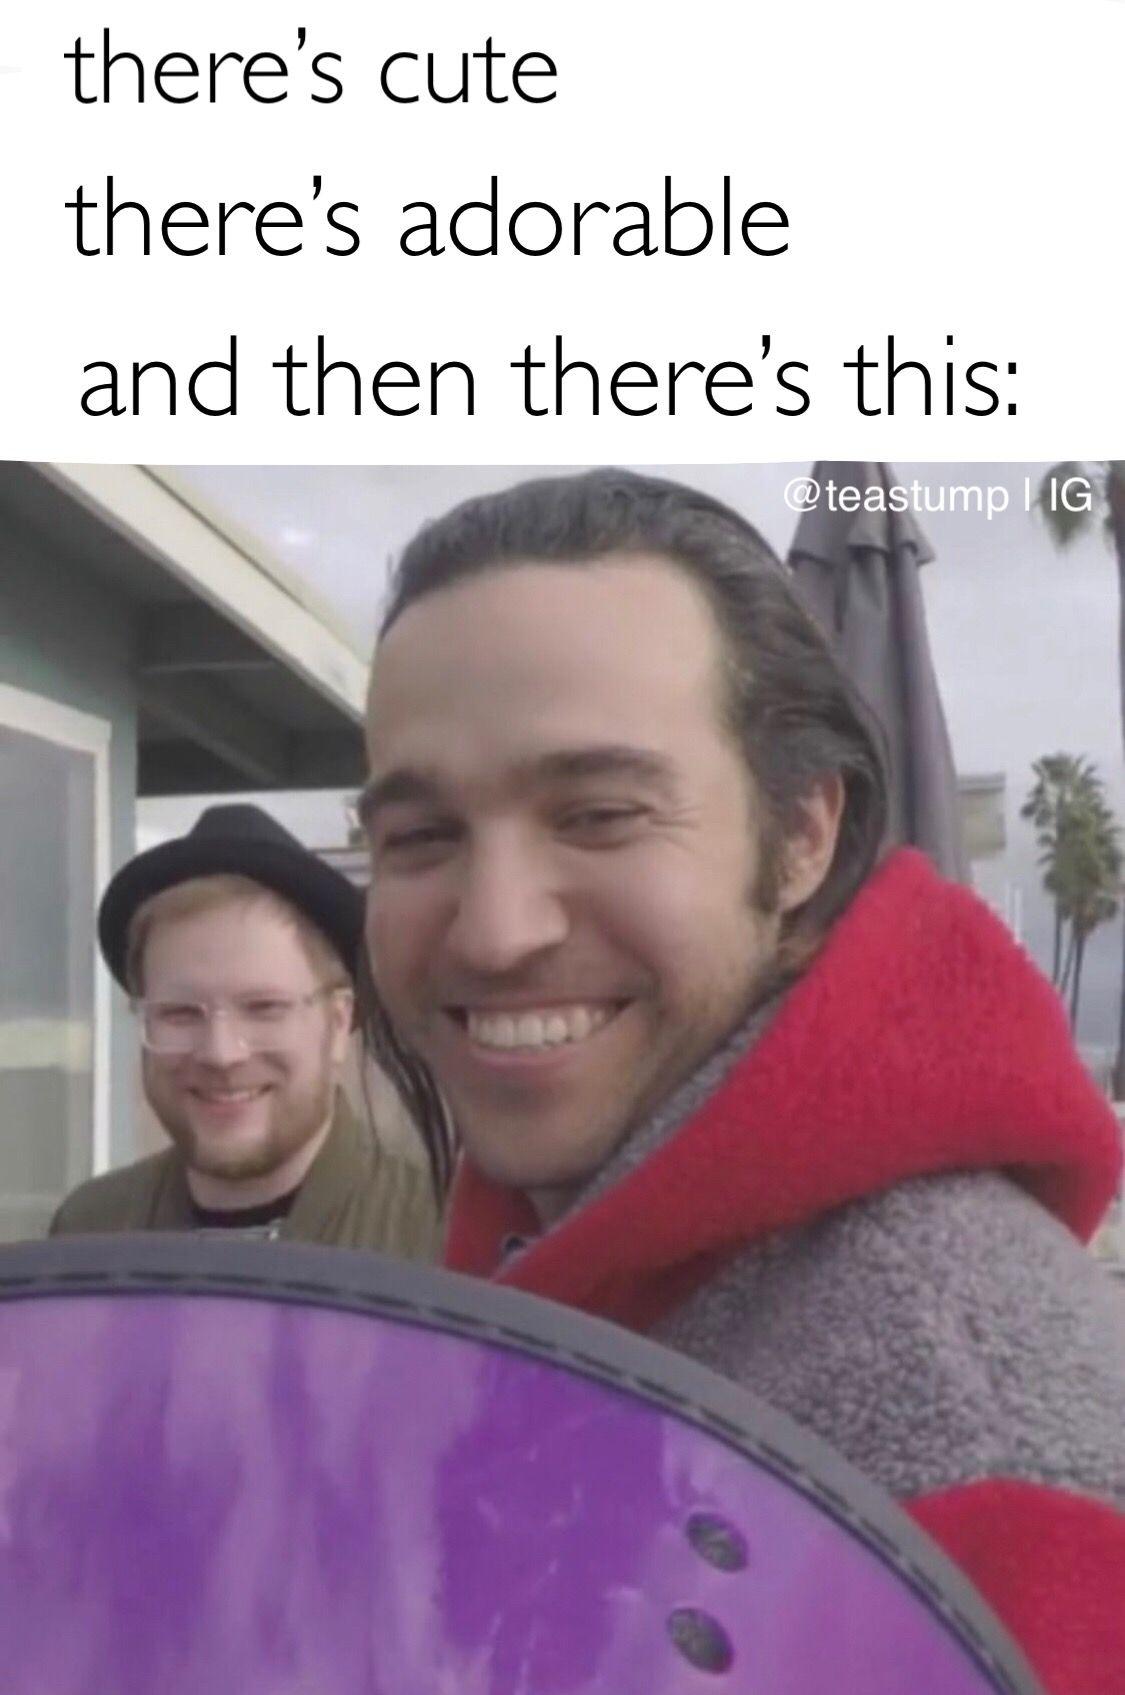 Roblox Memes Rock - Fall Out Boy Credit To Original Creators The Cutest